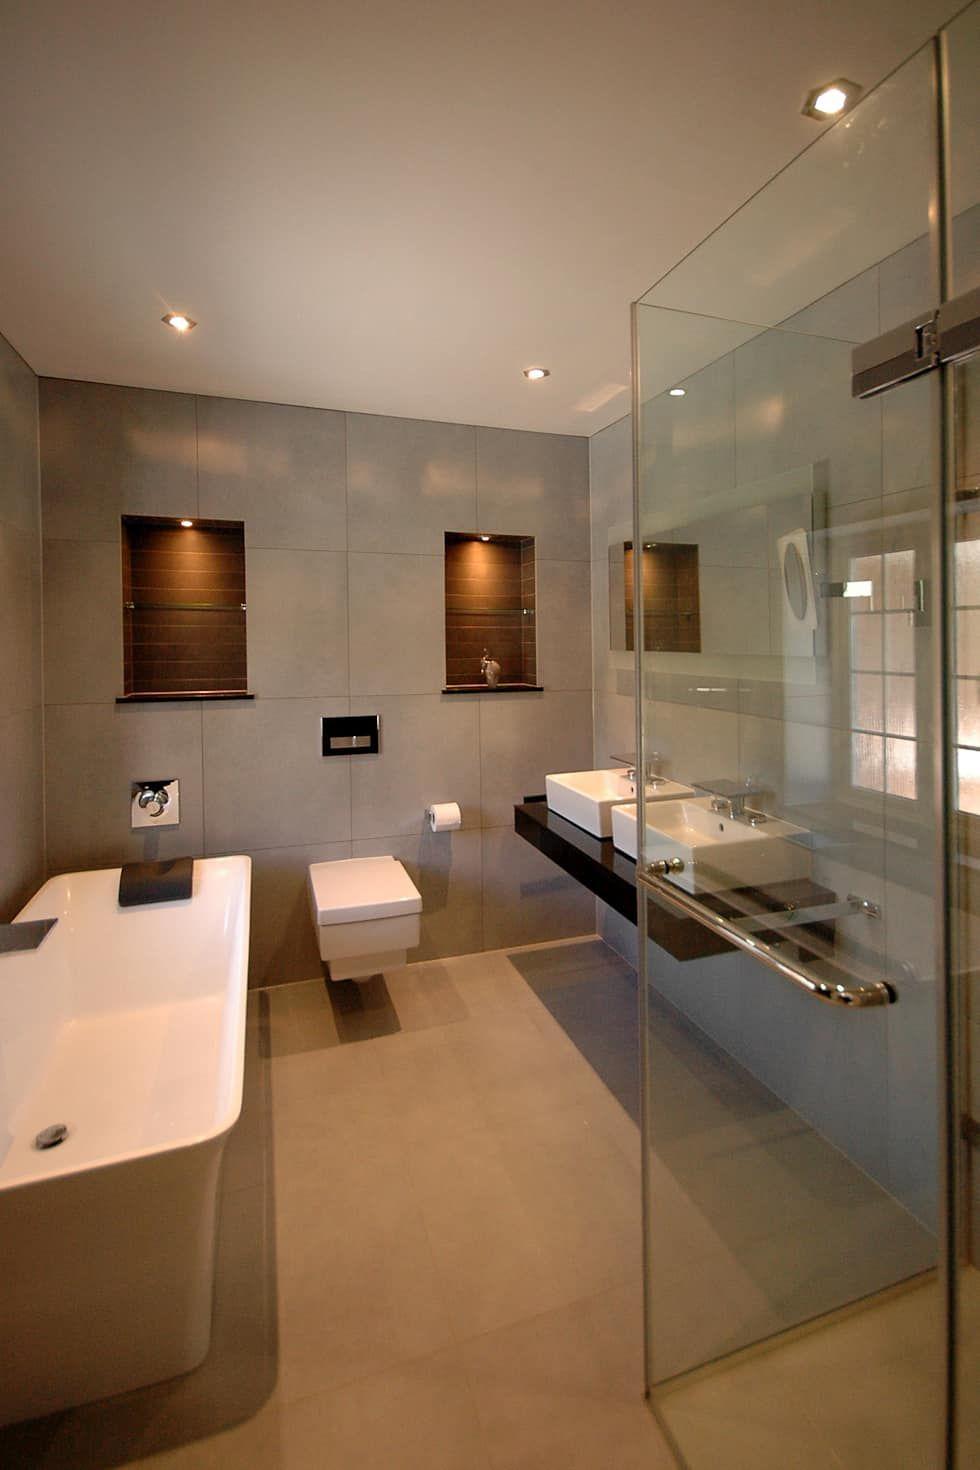 7 Essential Tips for Modern Bathroom Ideas for a Stylish ...